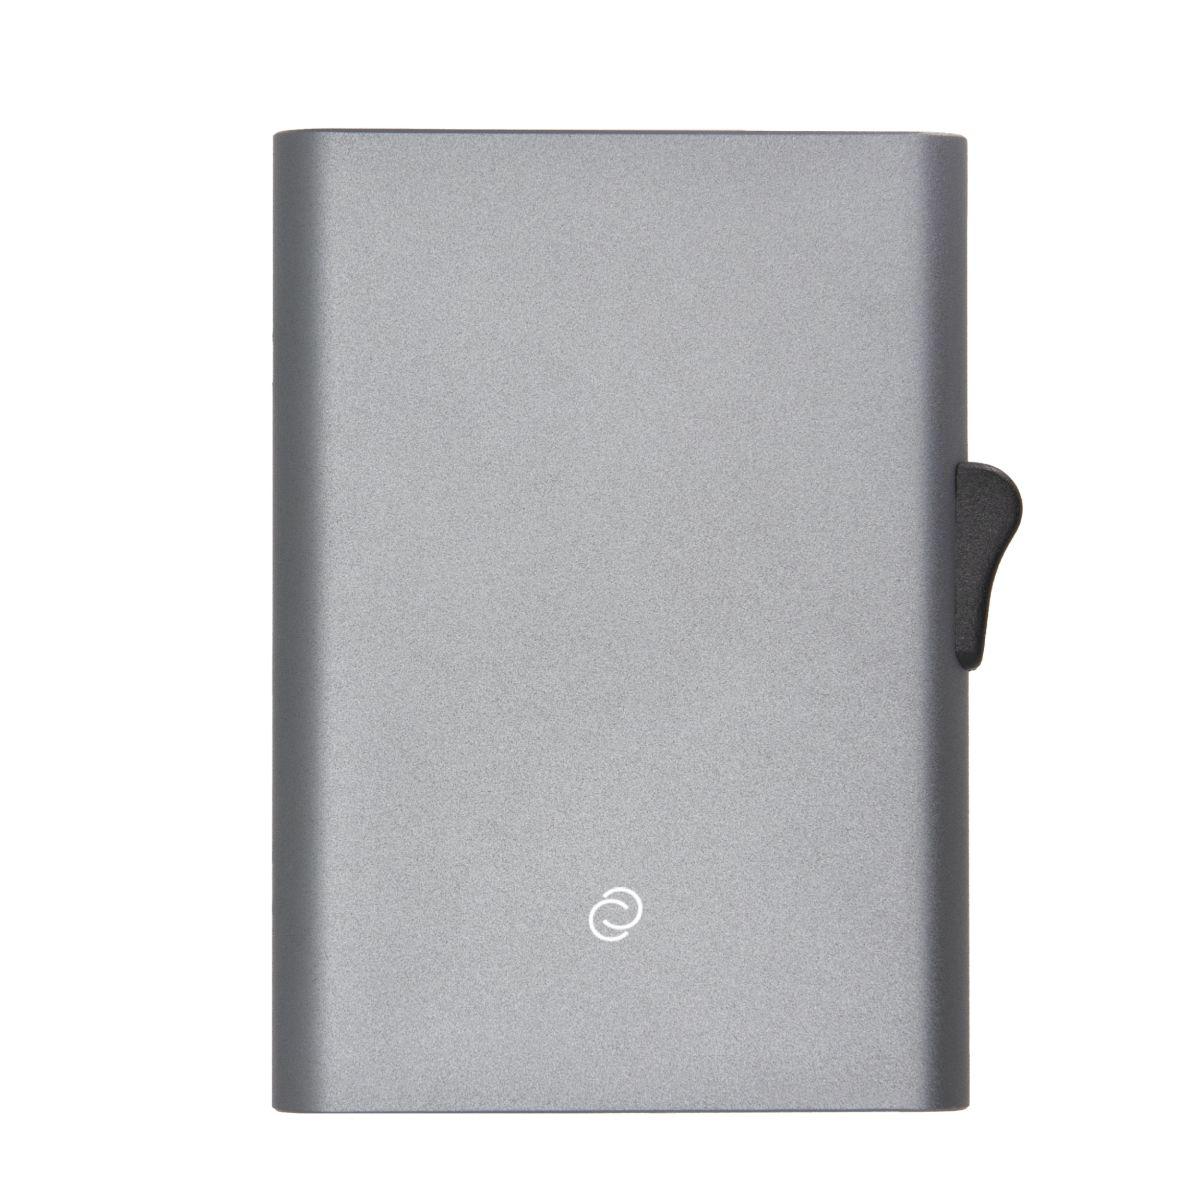 C-Secure Slim RFID XL Aluminum Card Holder - Grey